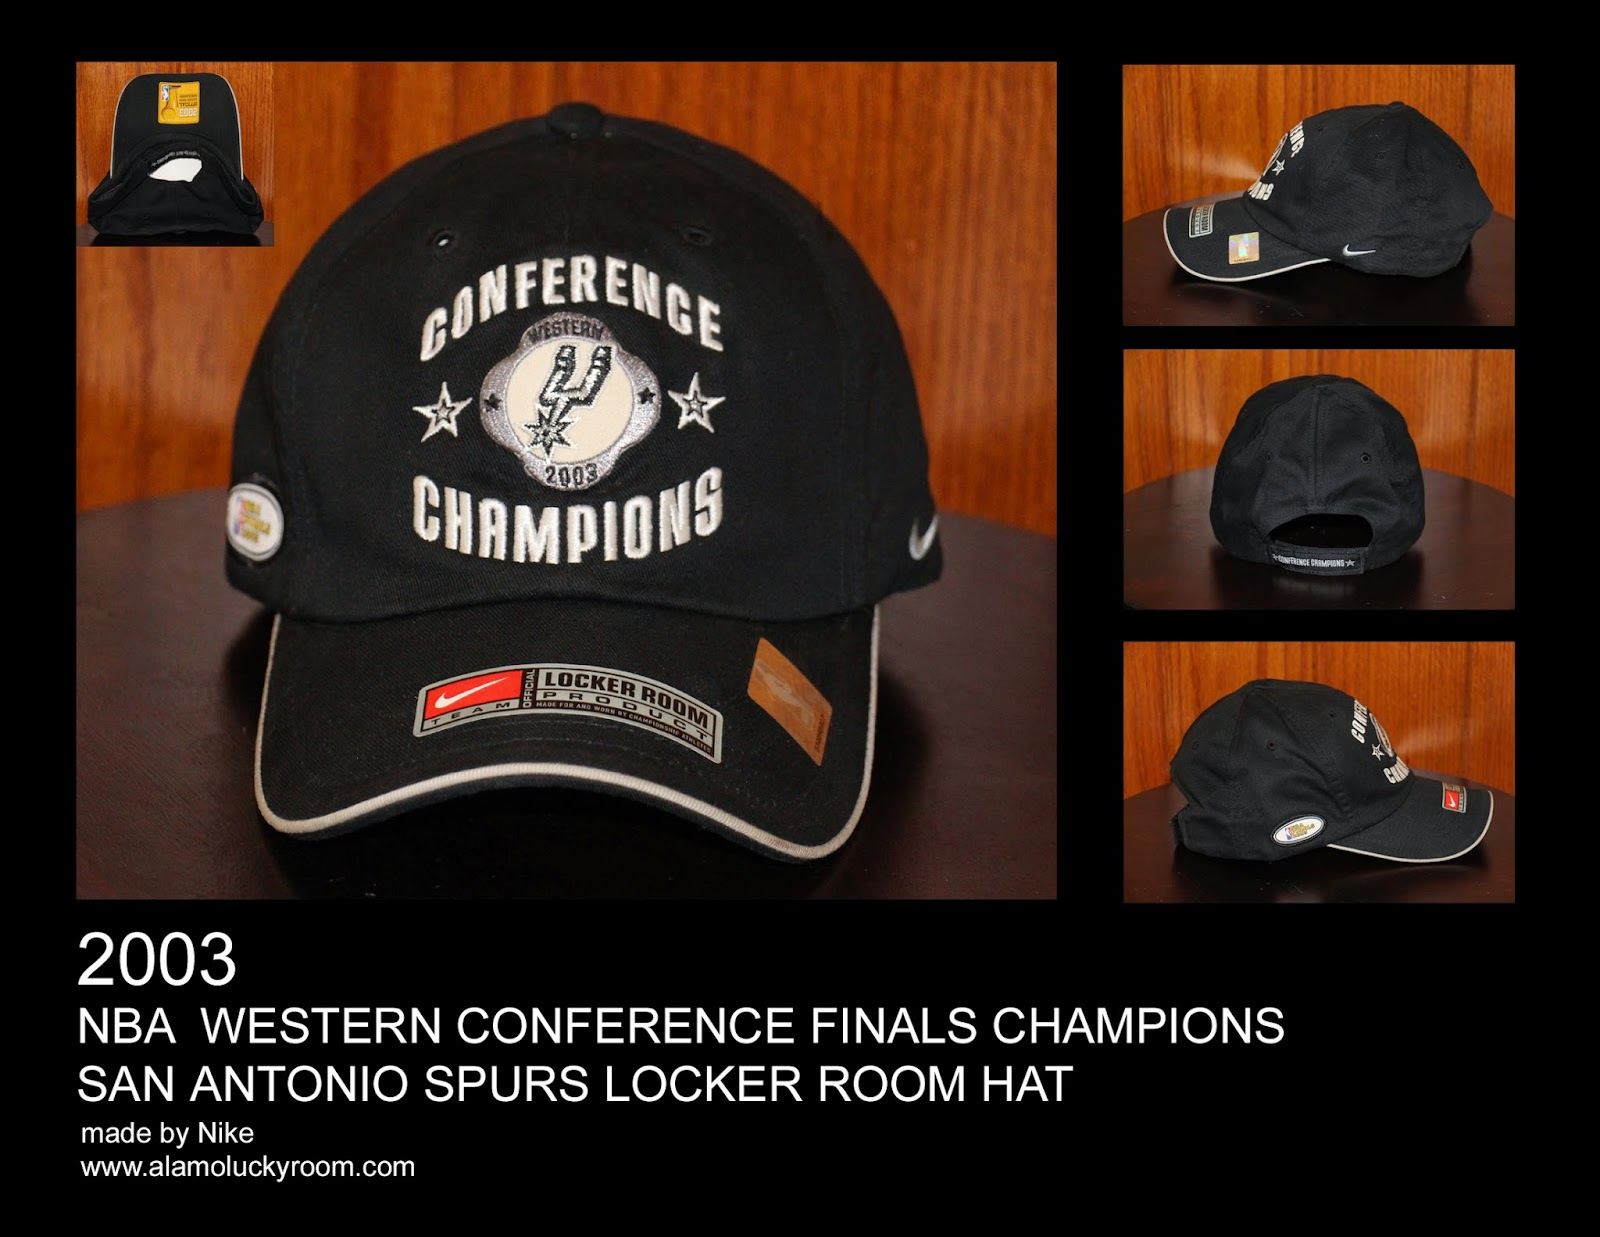 3dec4fa3bcb 2003 San Antonio Spurs NBA Western Conference Finals Champions Locker Room  Hat